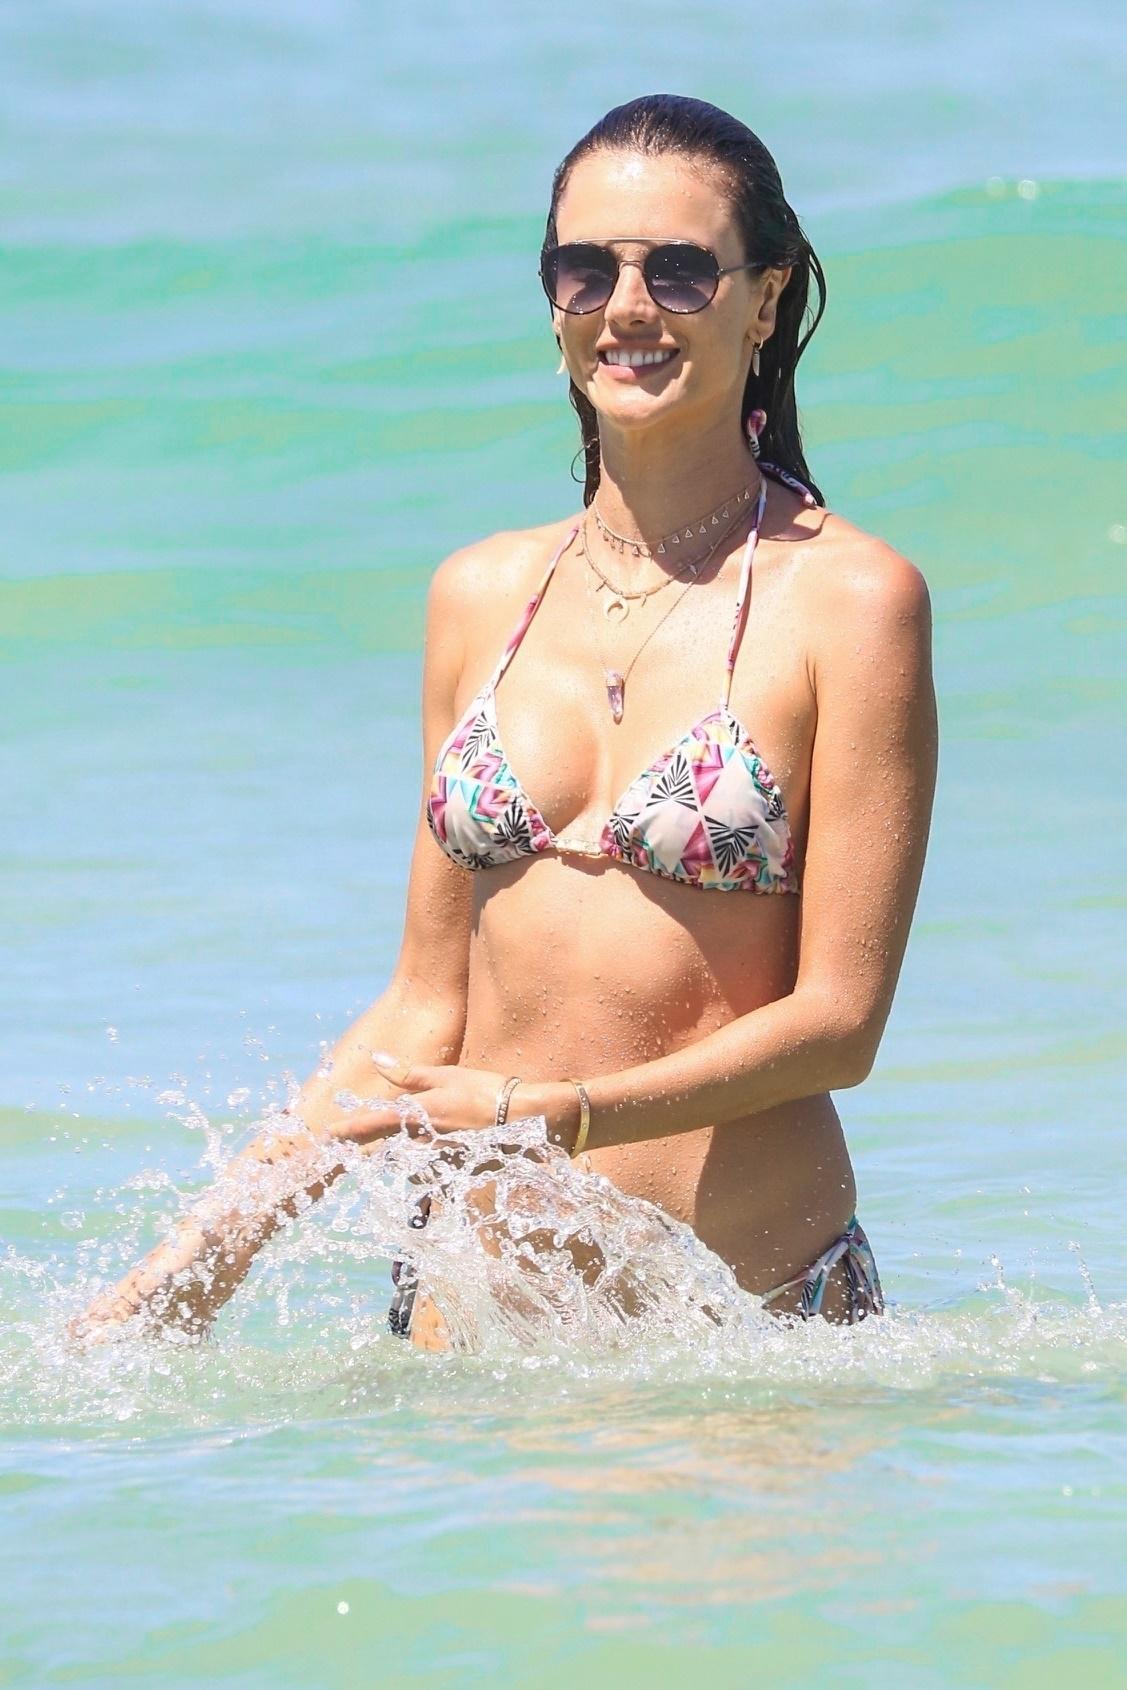 Snapchat Ludi Delfino naked (67 photo), Pussy, Bikini, Feet, bra 2006